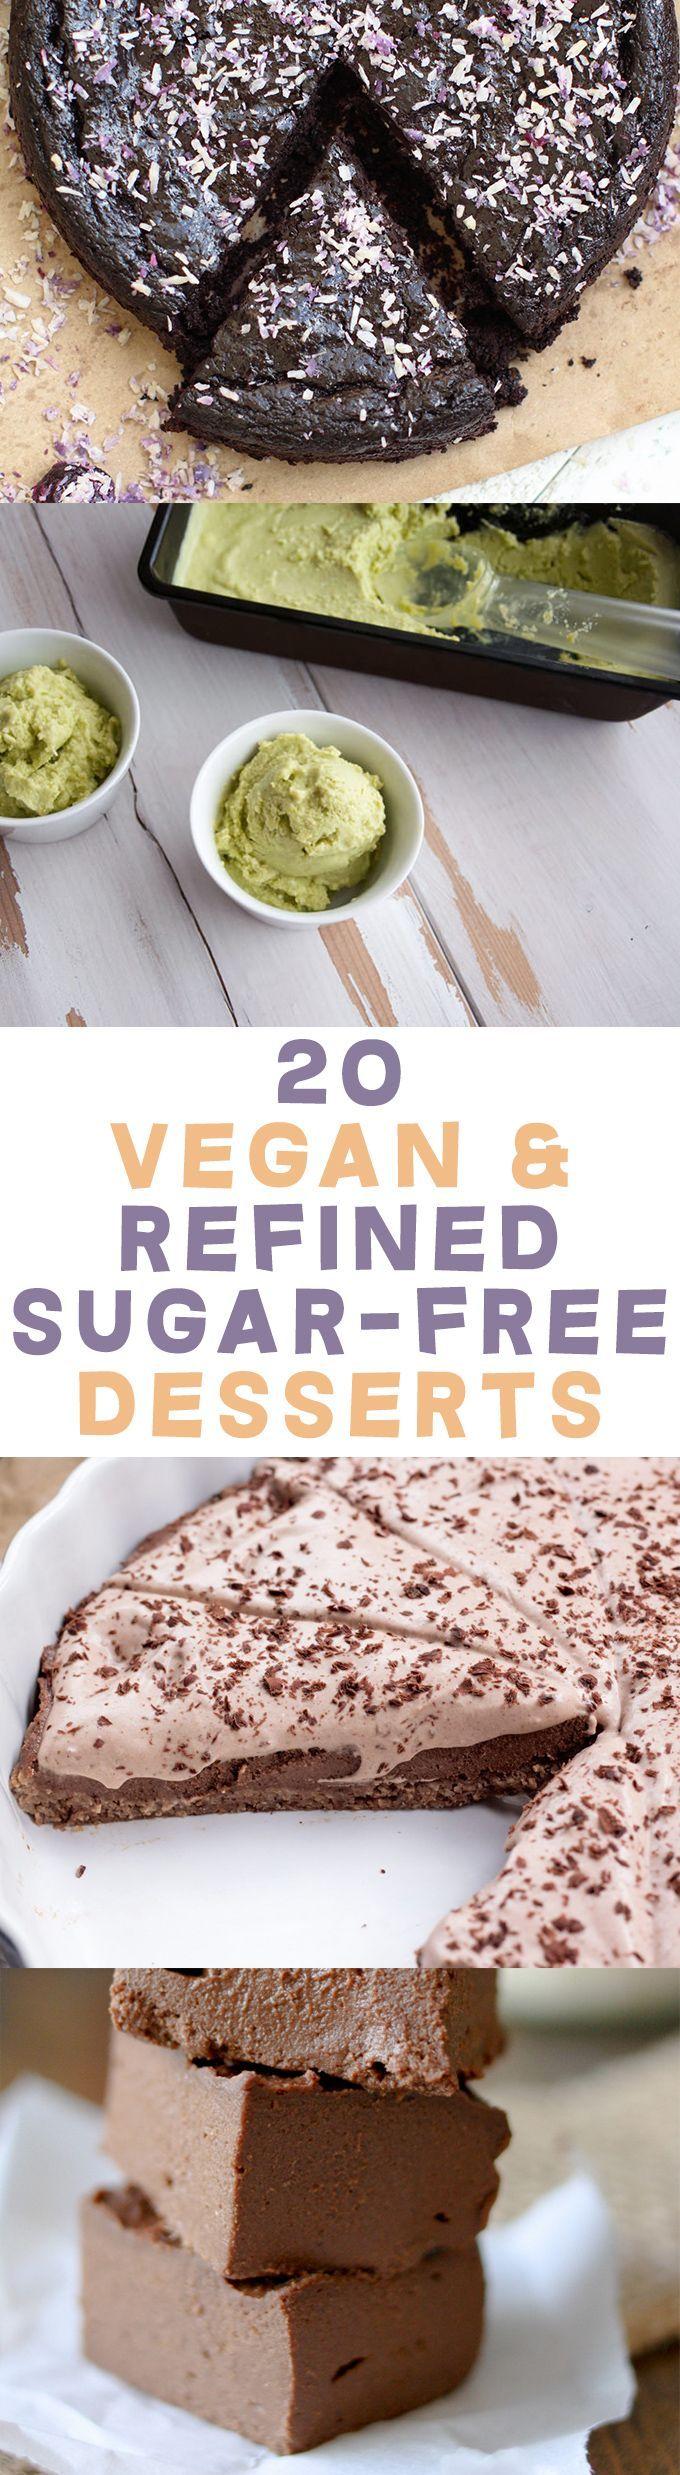 Pin By Calgary Isgreen On Green Gourmet Vegan Dessert